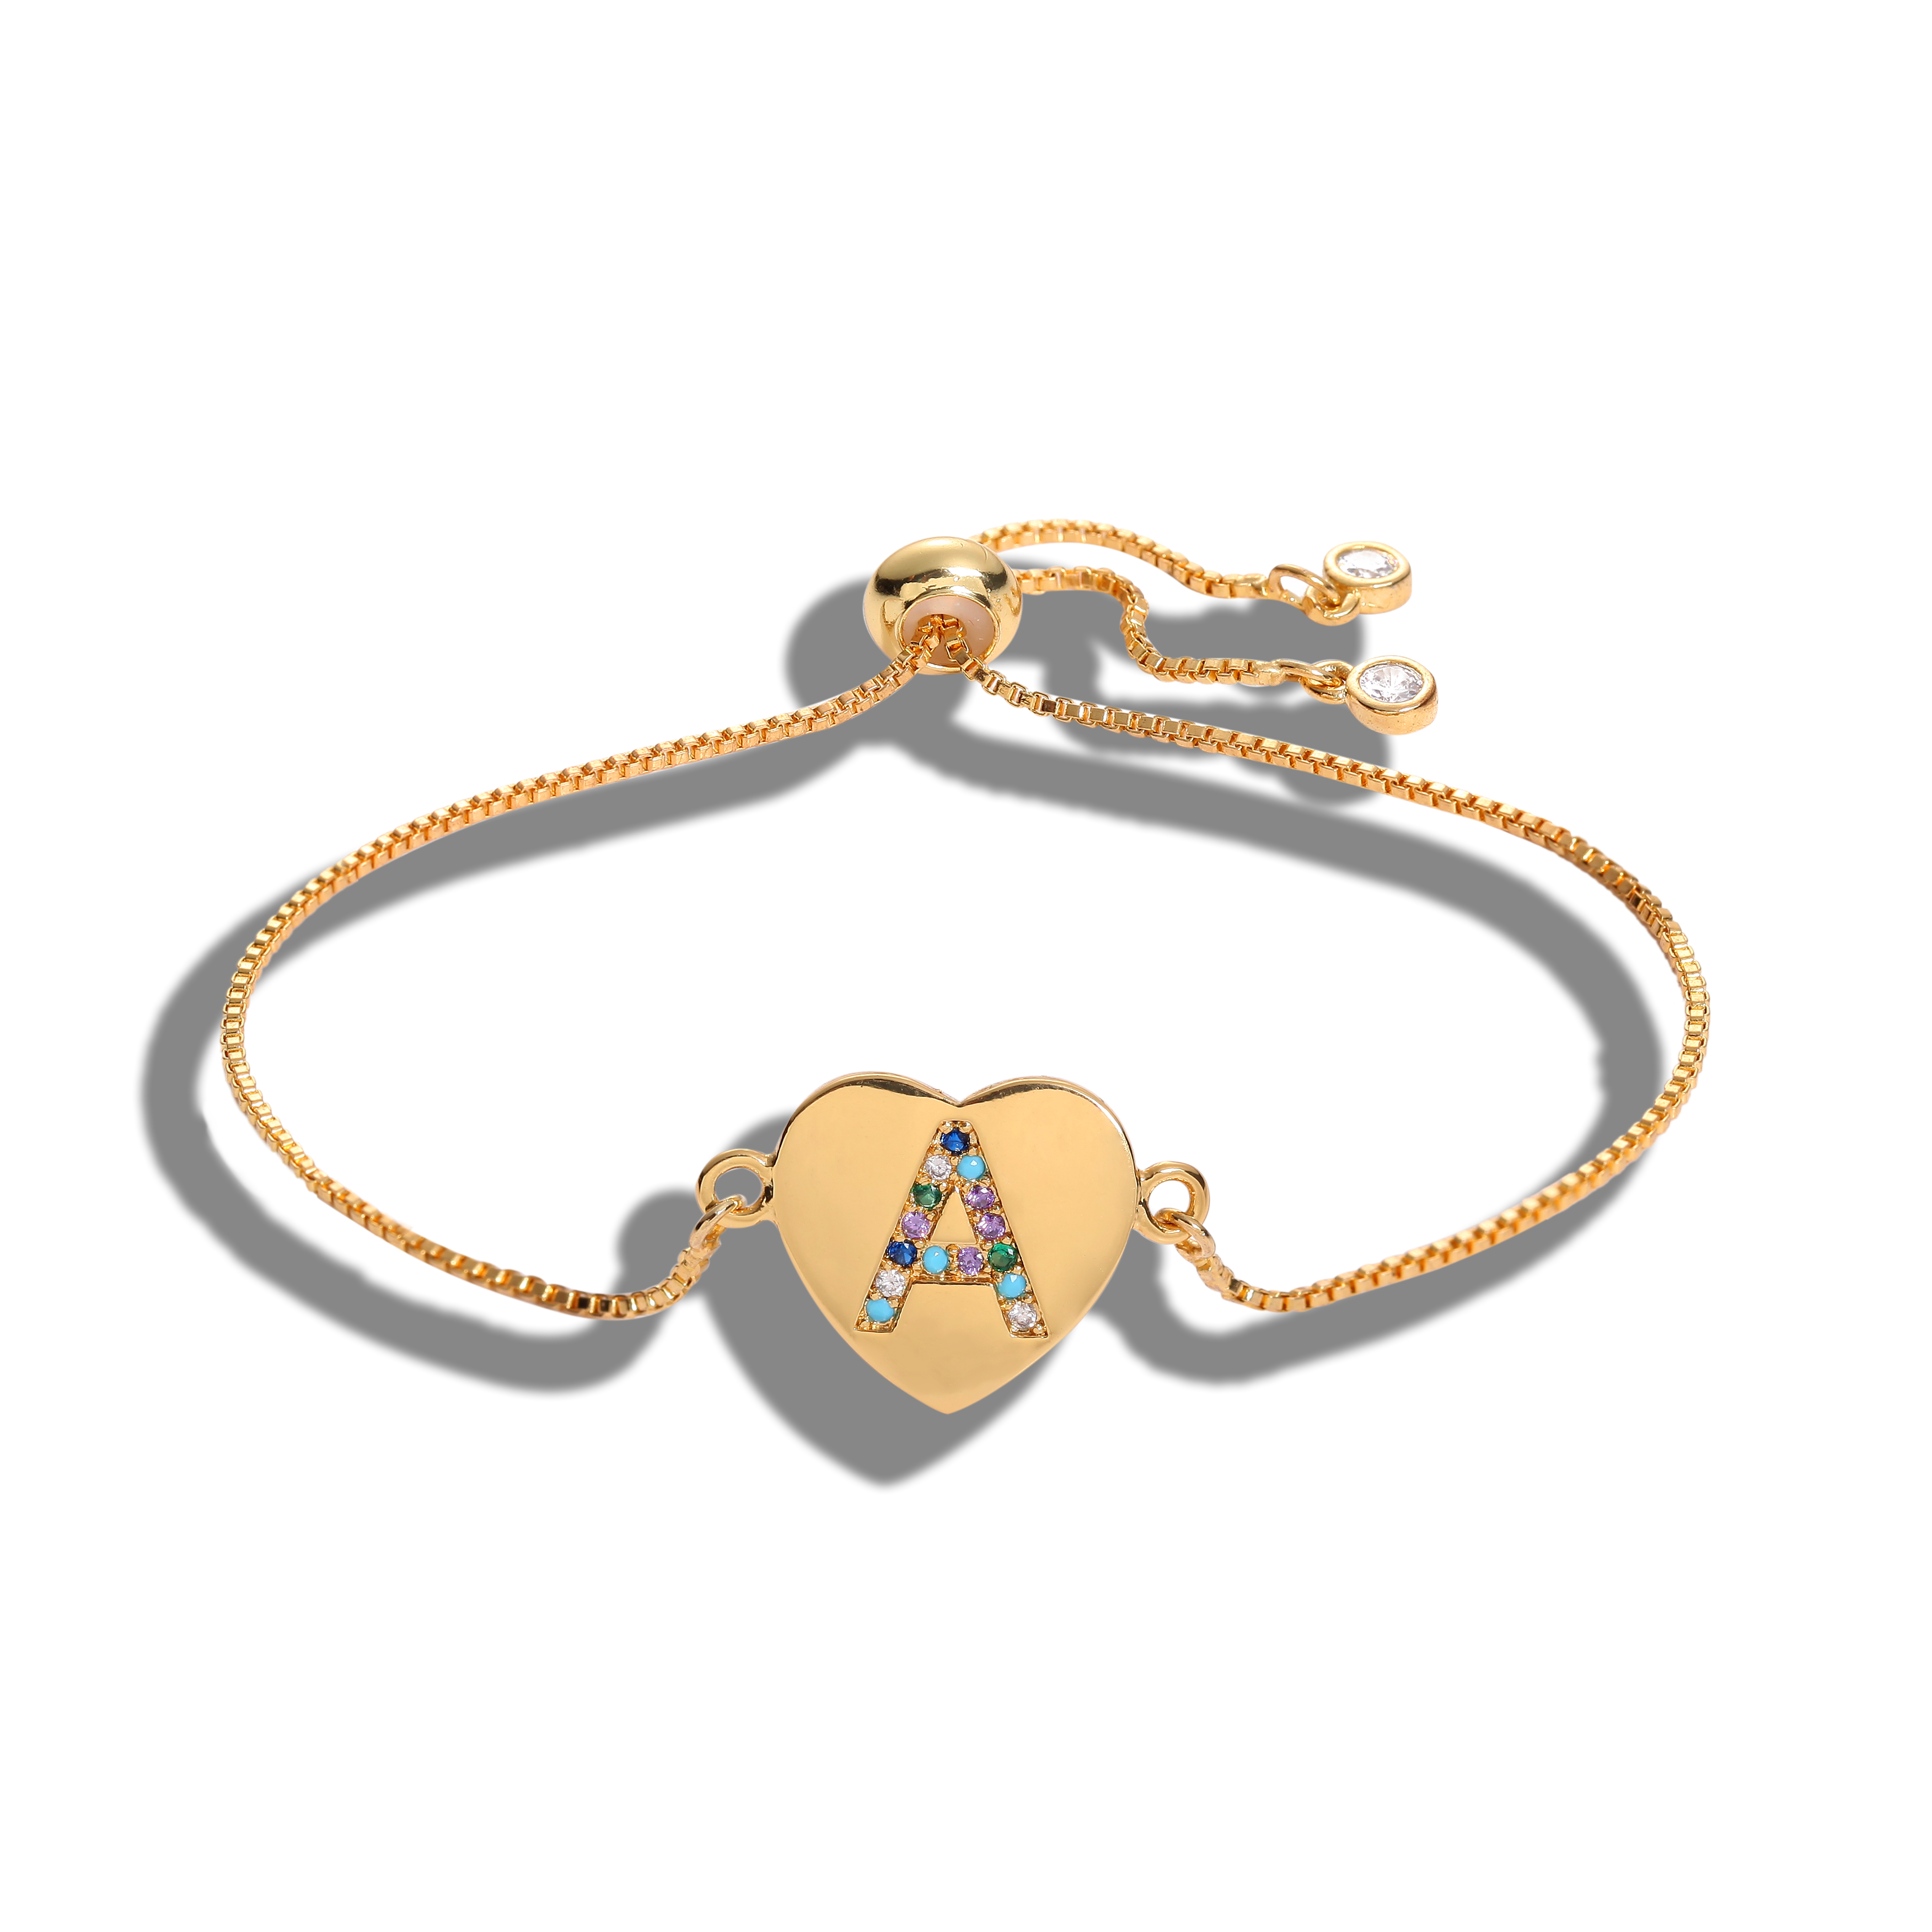 Rainbow 26 Letter Letter Charm Bracelet Cubic Zirconia Female Copper A-Z Initial Chain Ladies Bracelet Jewelry Adjustable Size